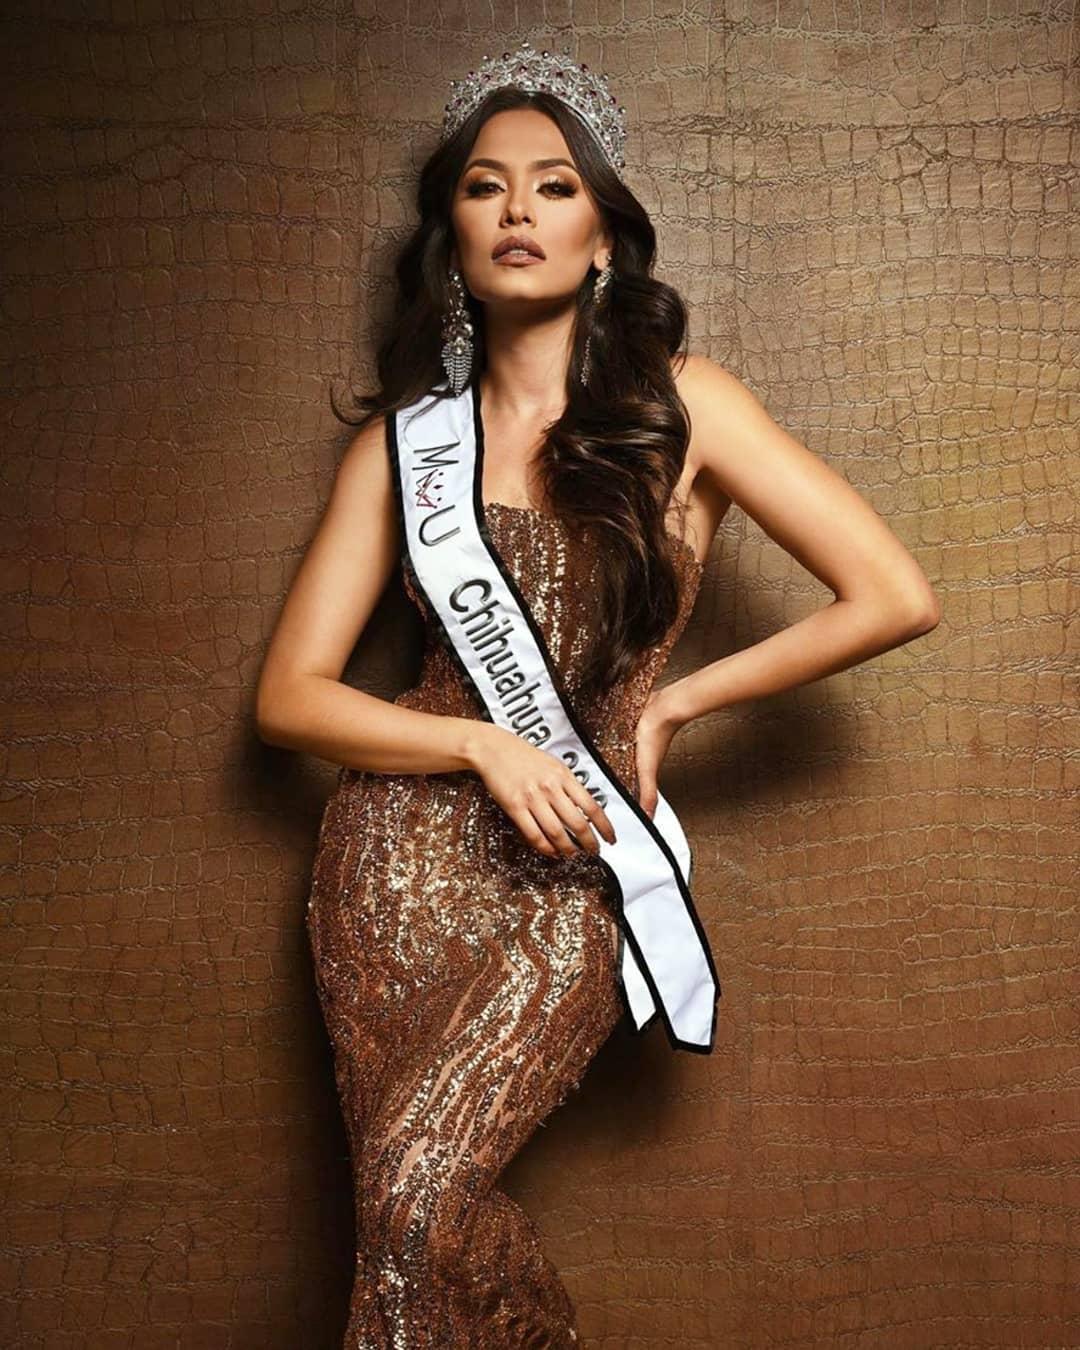 andrea meza, mexicana universal chihuahua 2020/1st runner-up de miss world 2017. - Página 41 80132910